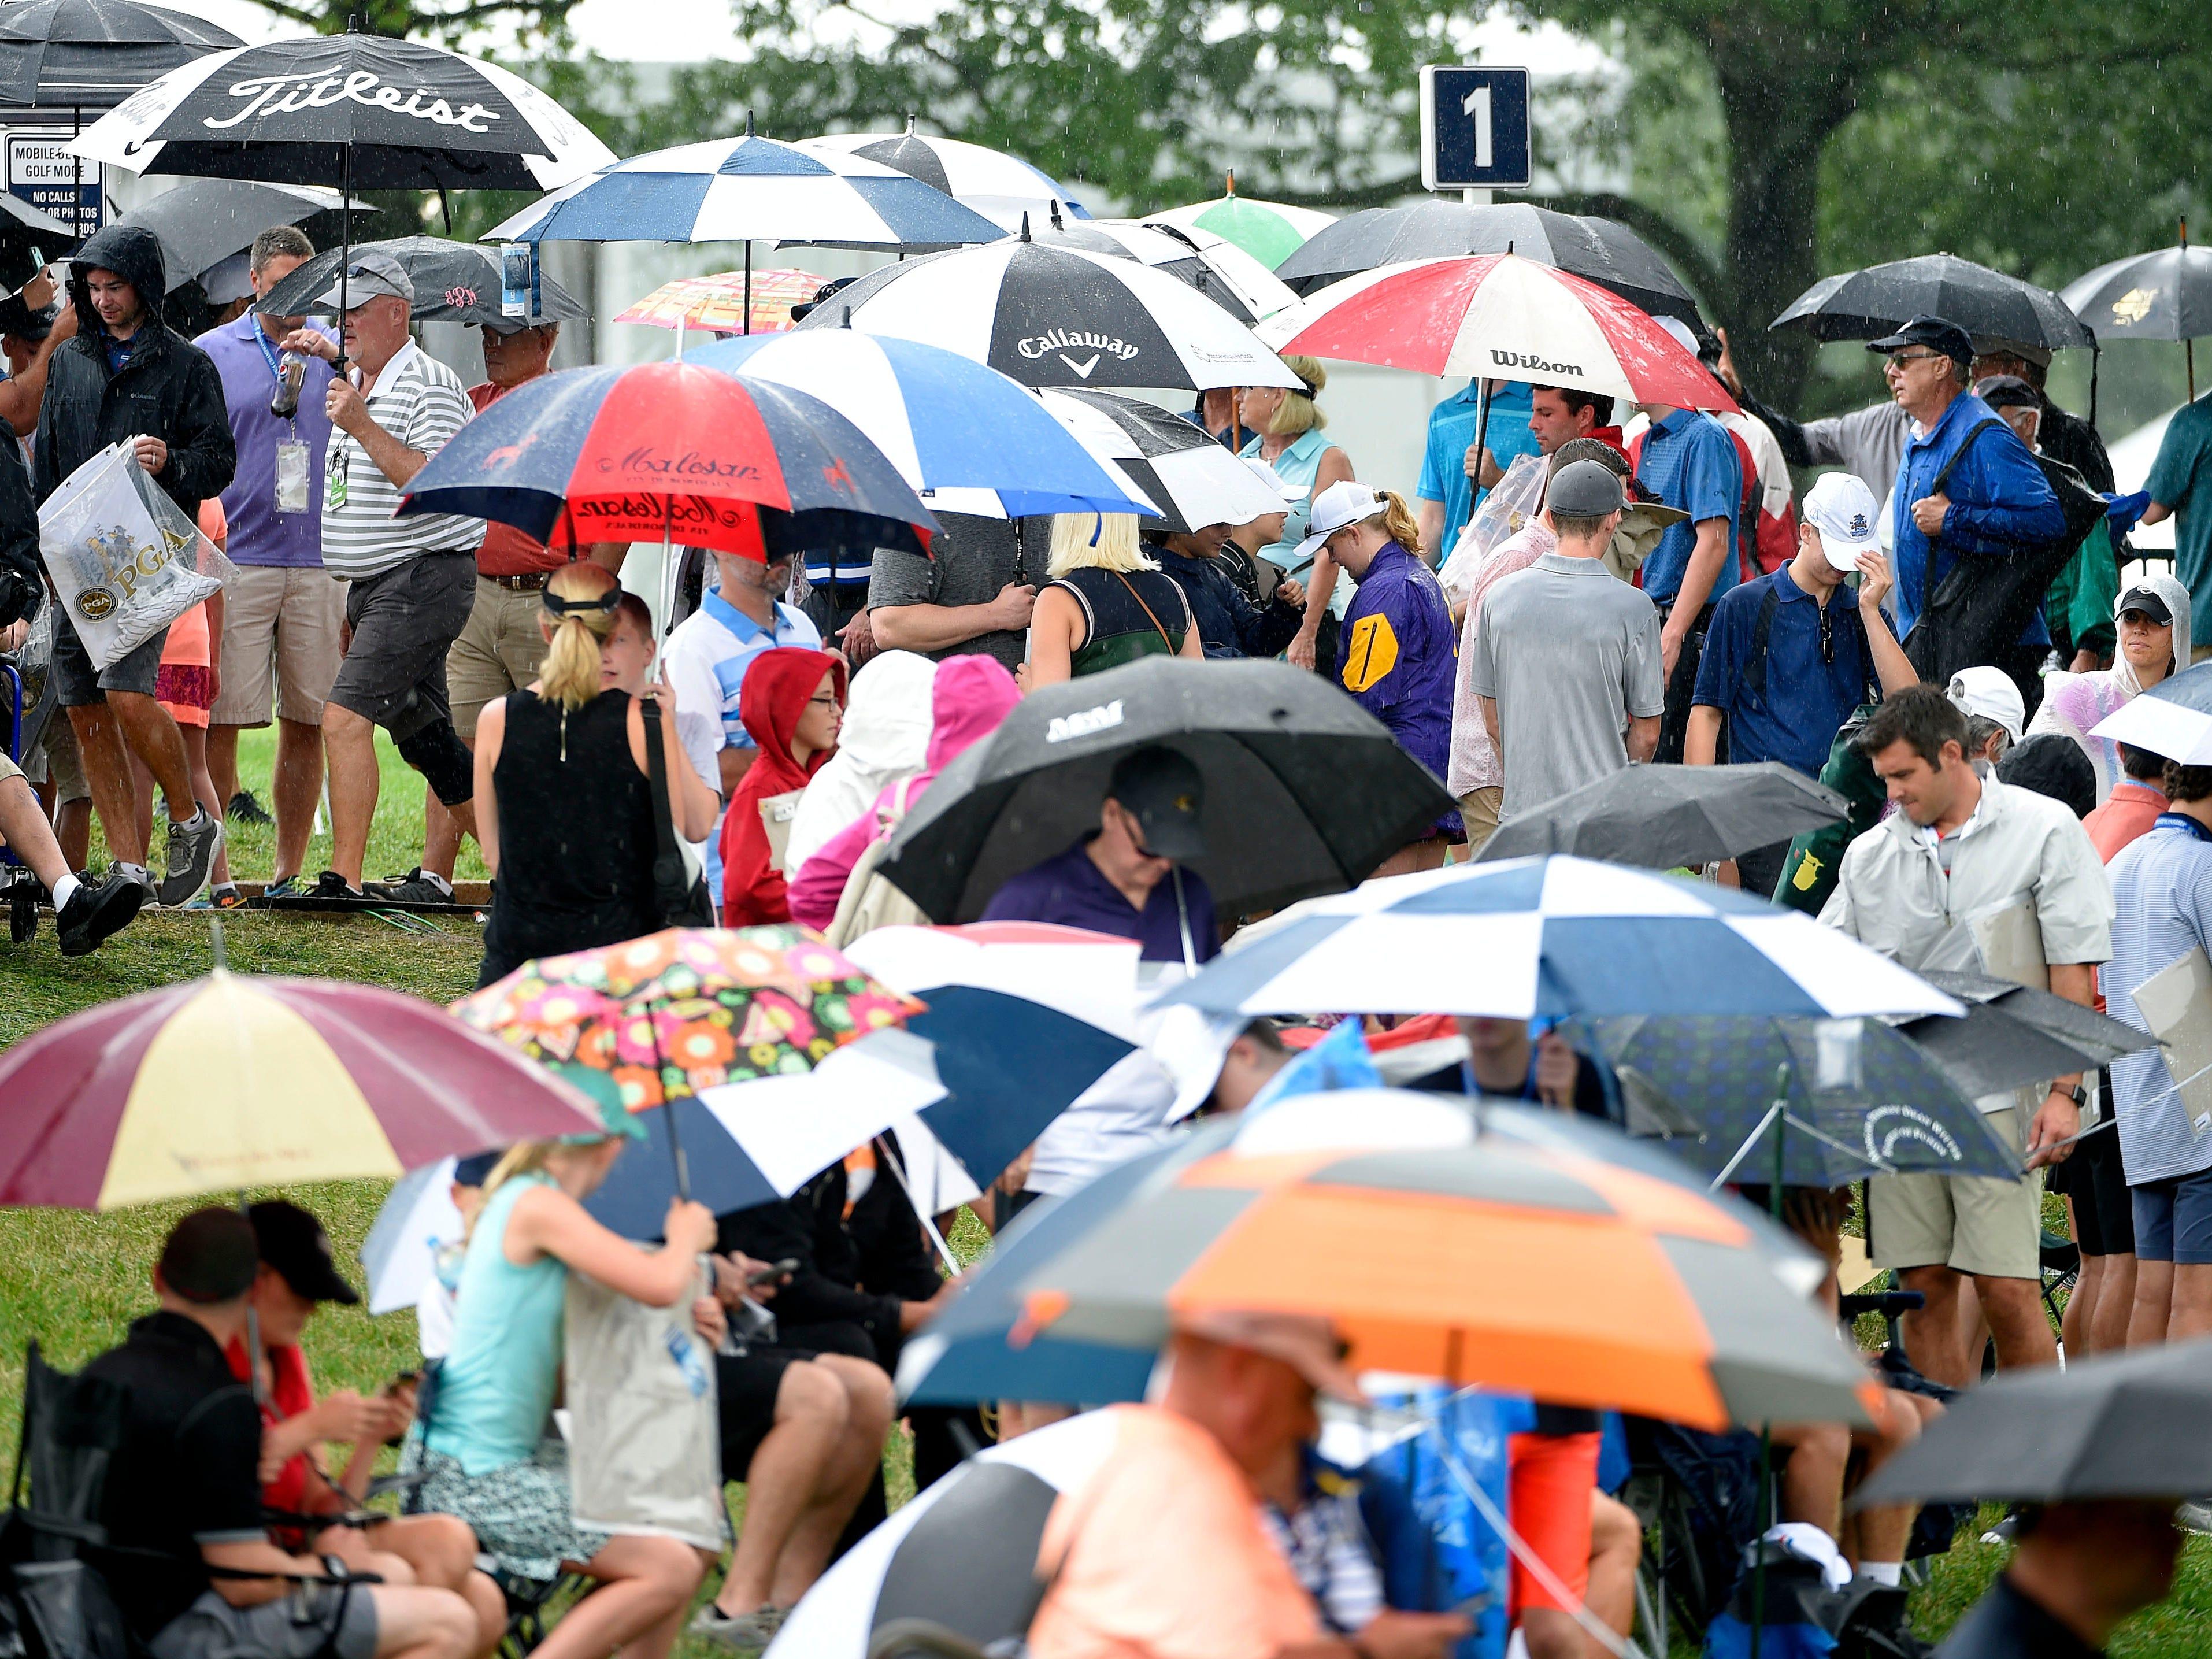 Spectators seek shelter during a downpour.